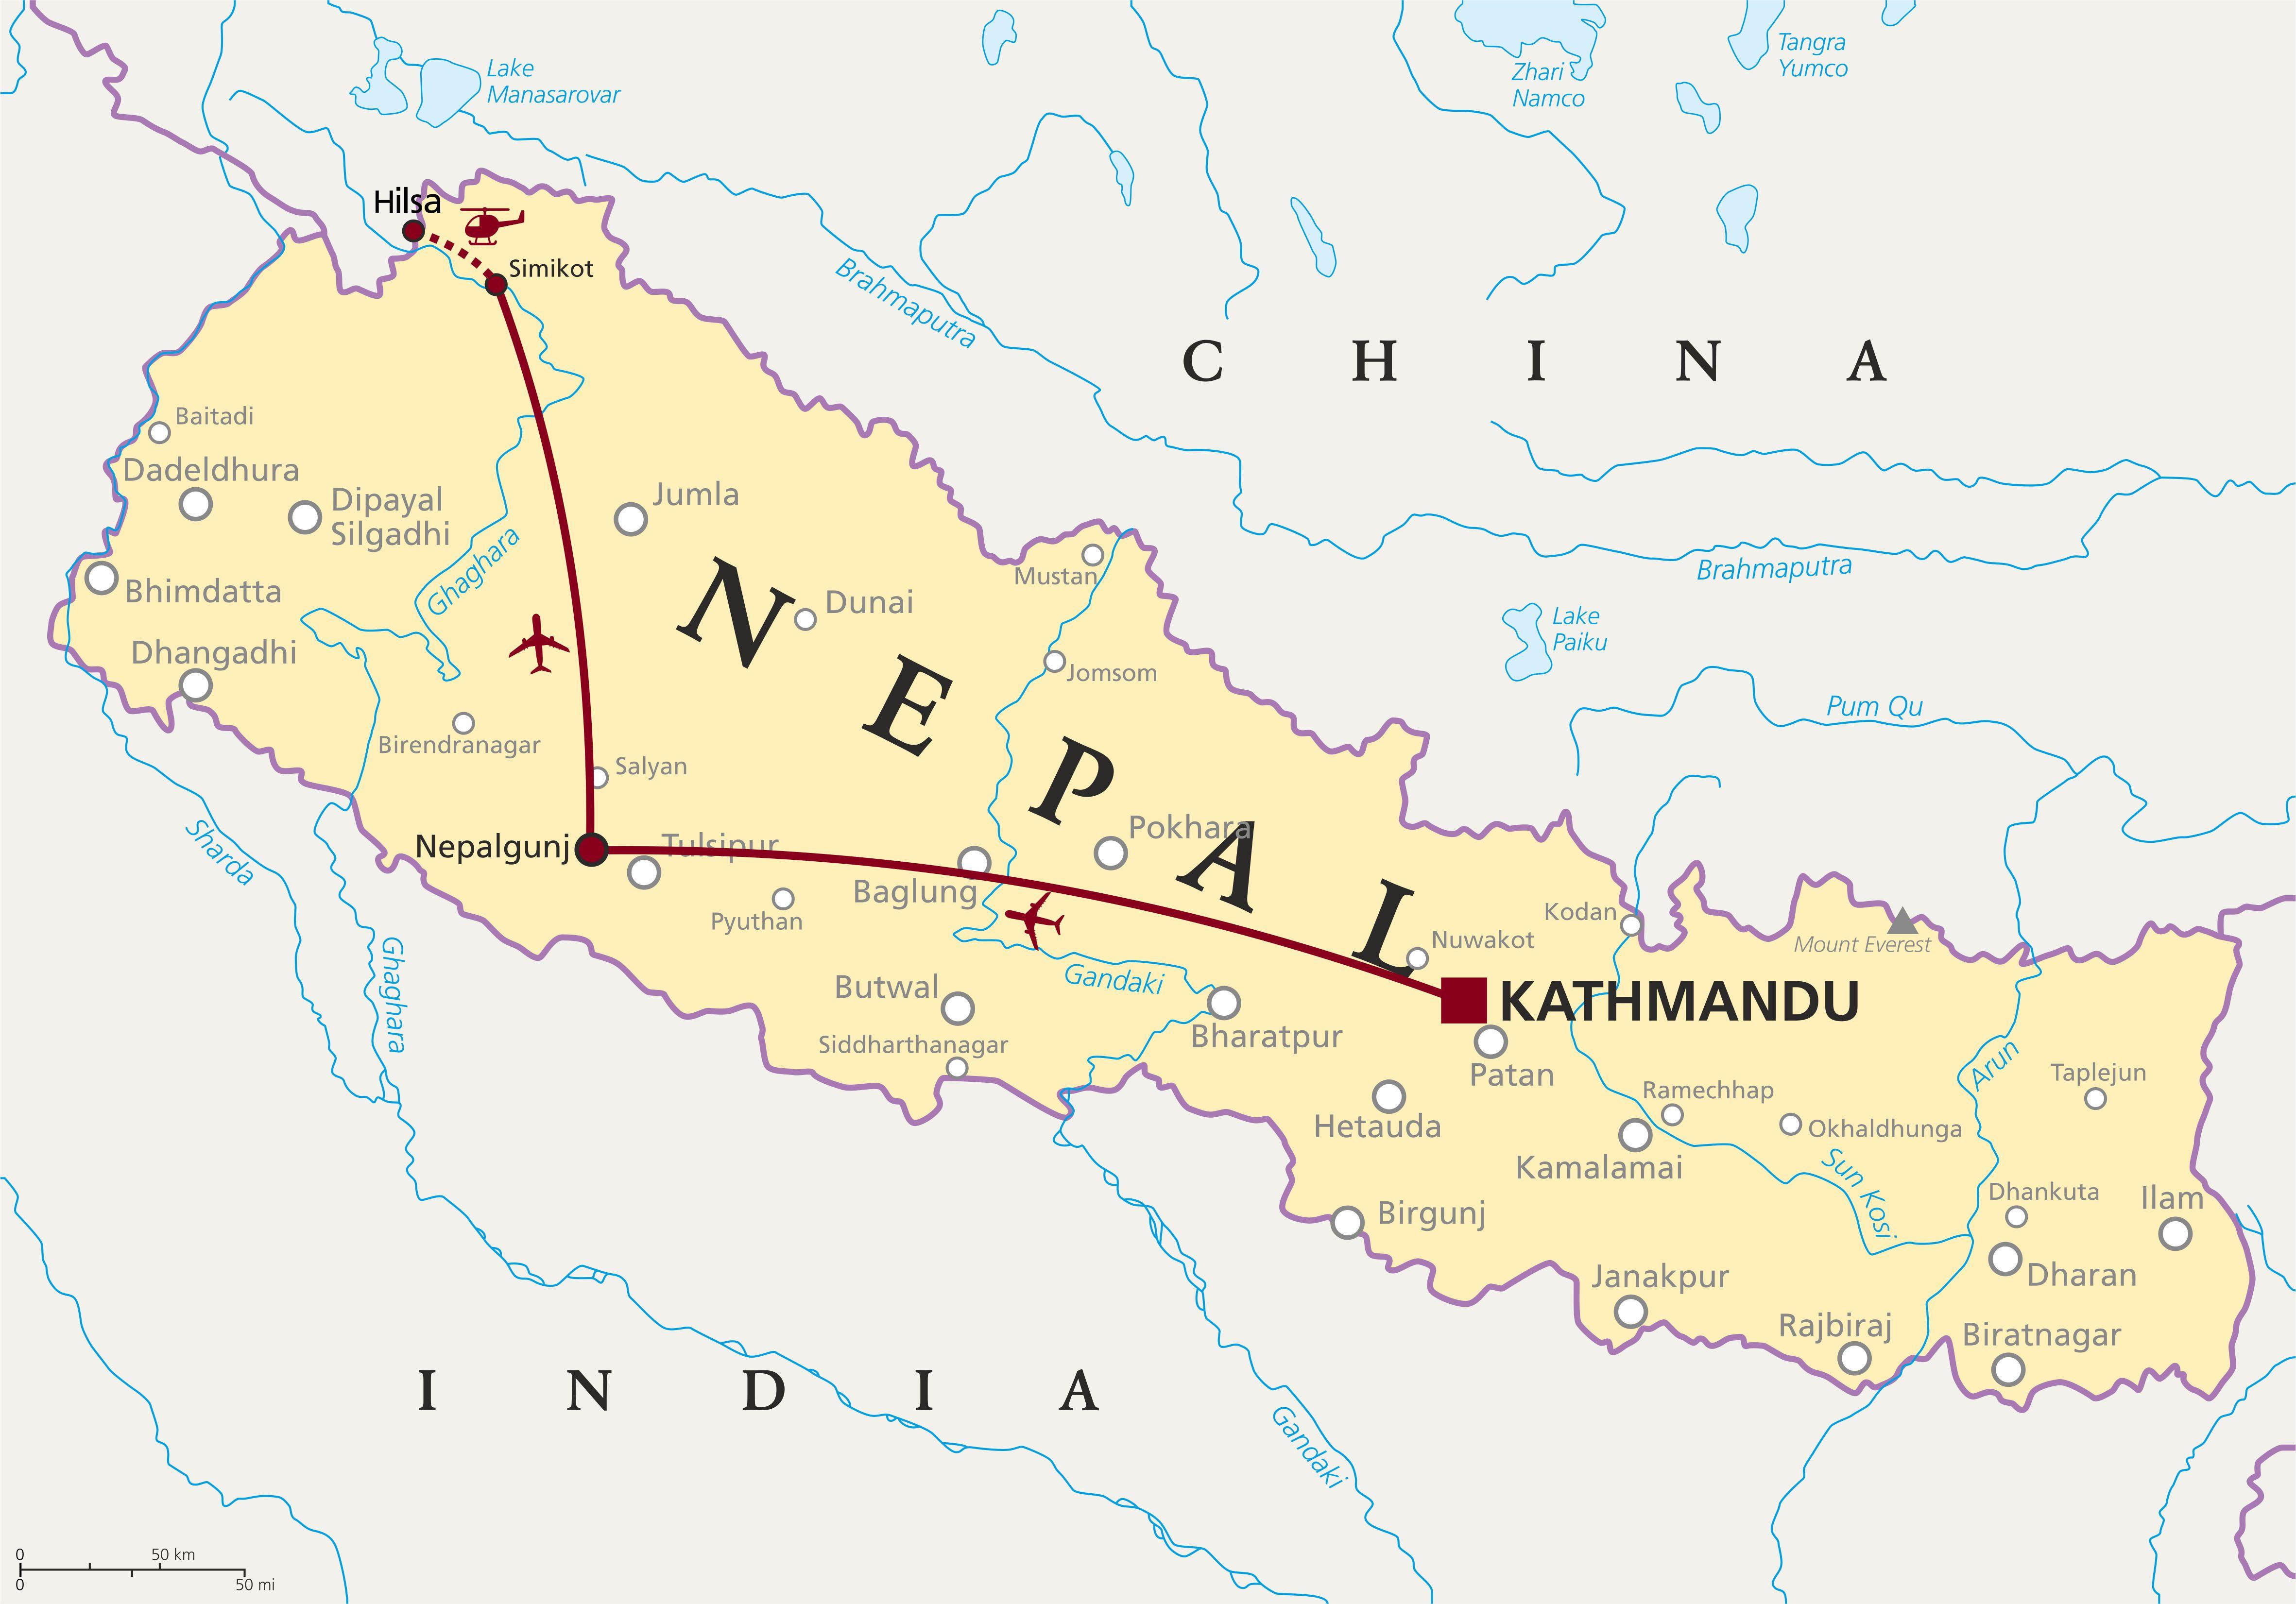 Nepal Map Kathmandu to Purong Tibet via flights and helicopter